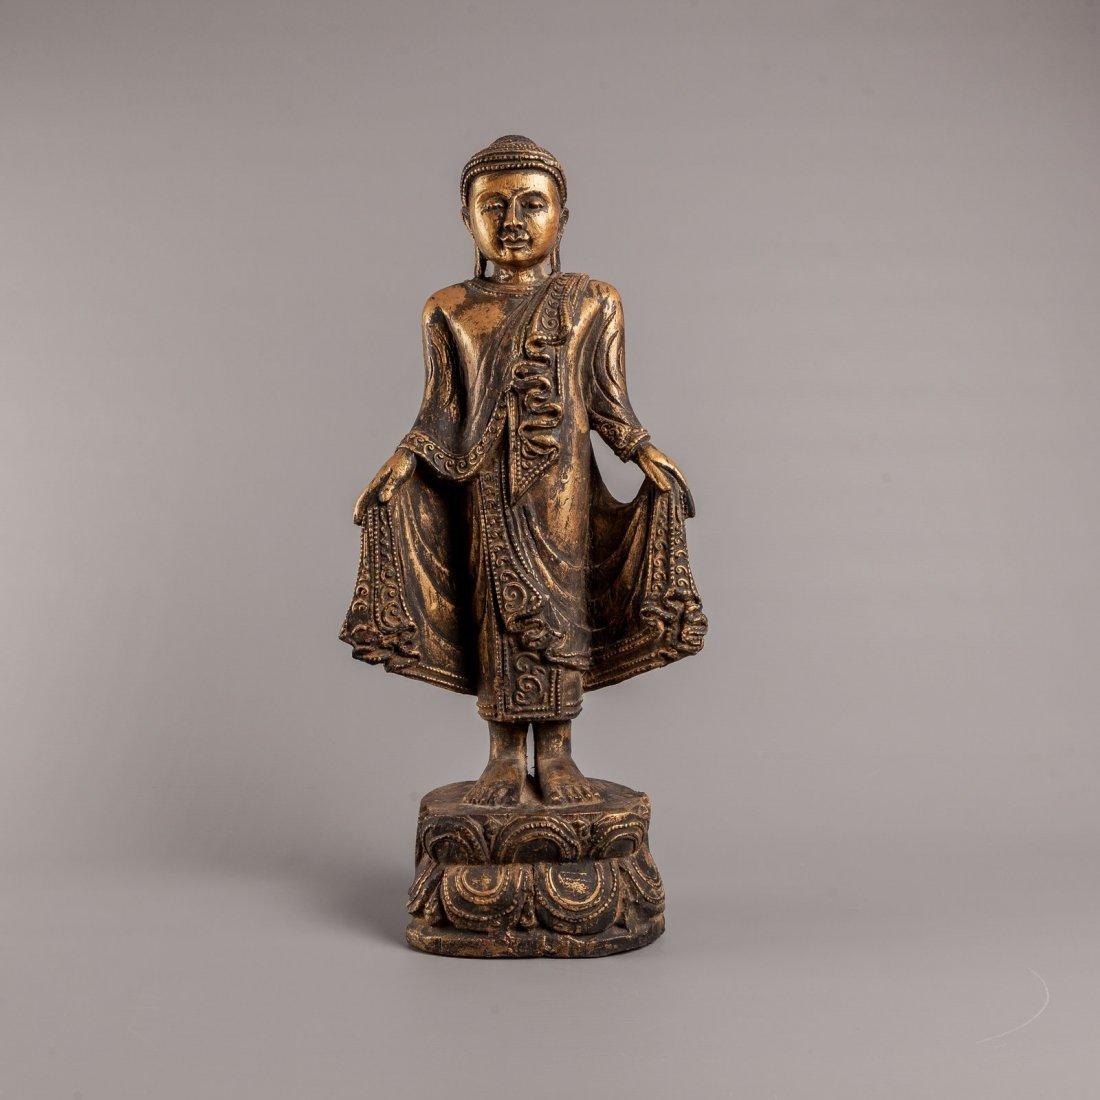 Antique 19th Century Standing Mandalay Style Buddha